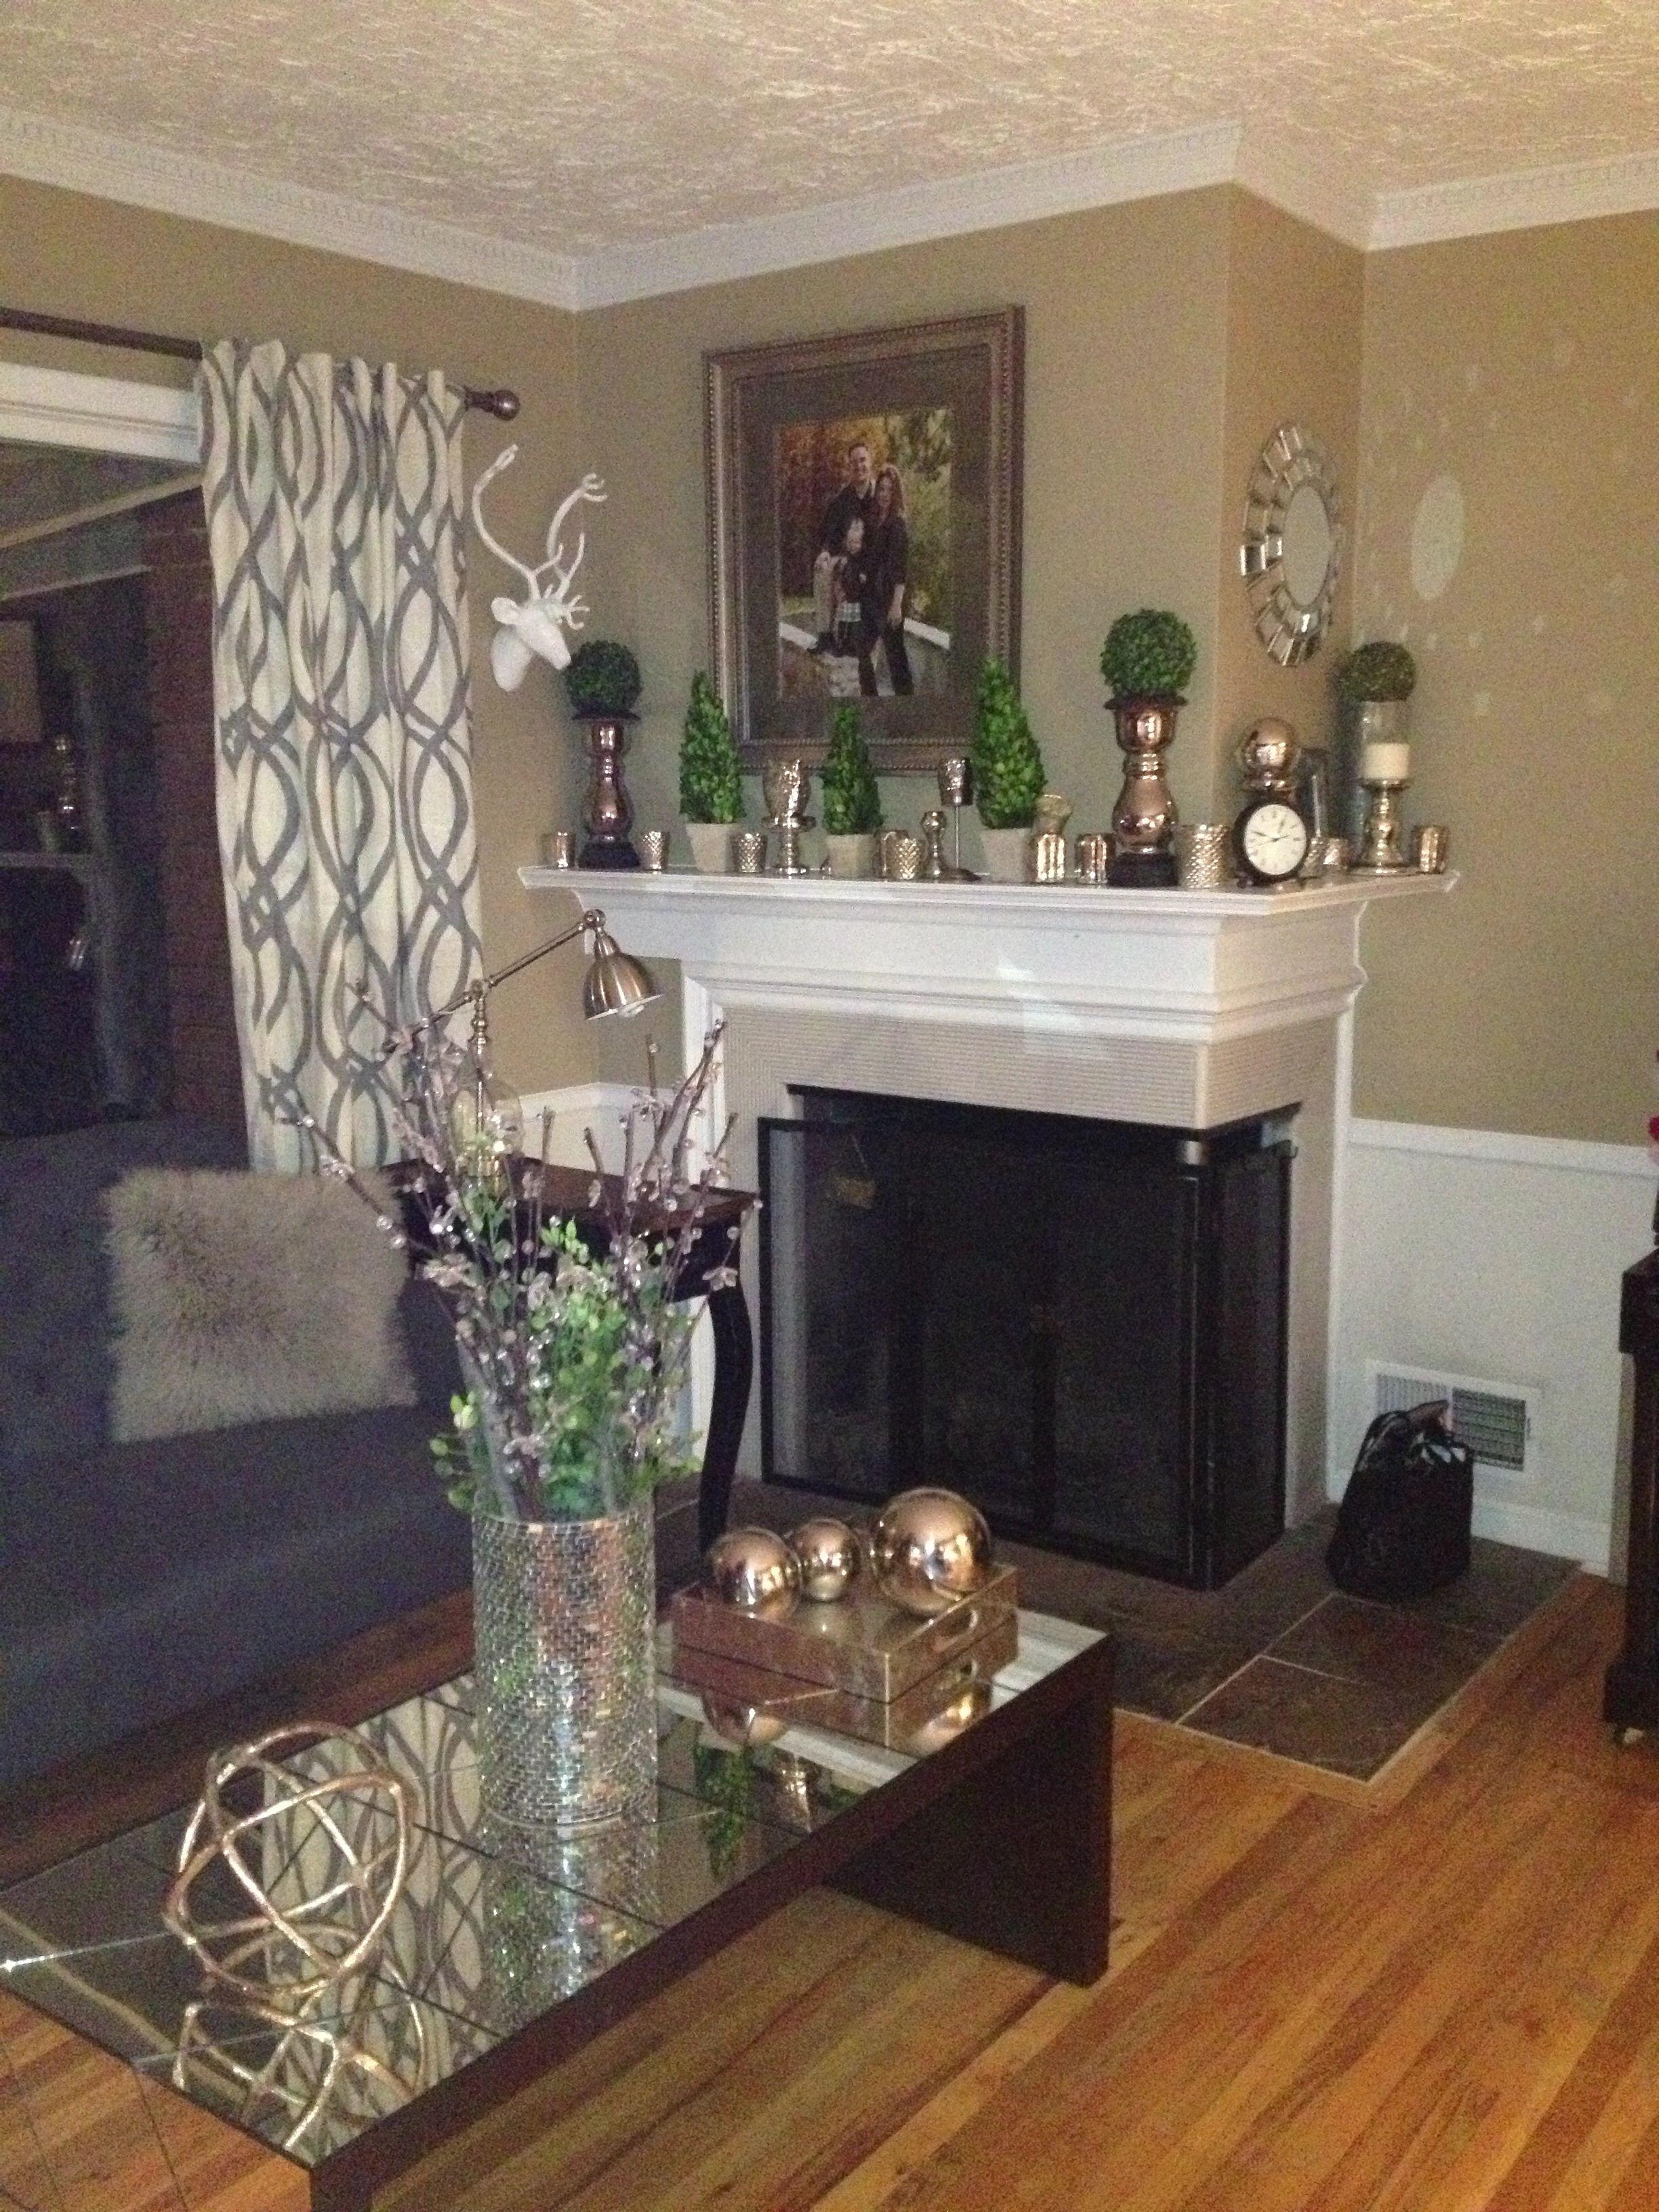 Living room decor - urbanity interiors